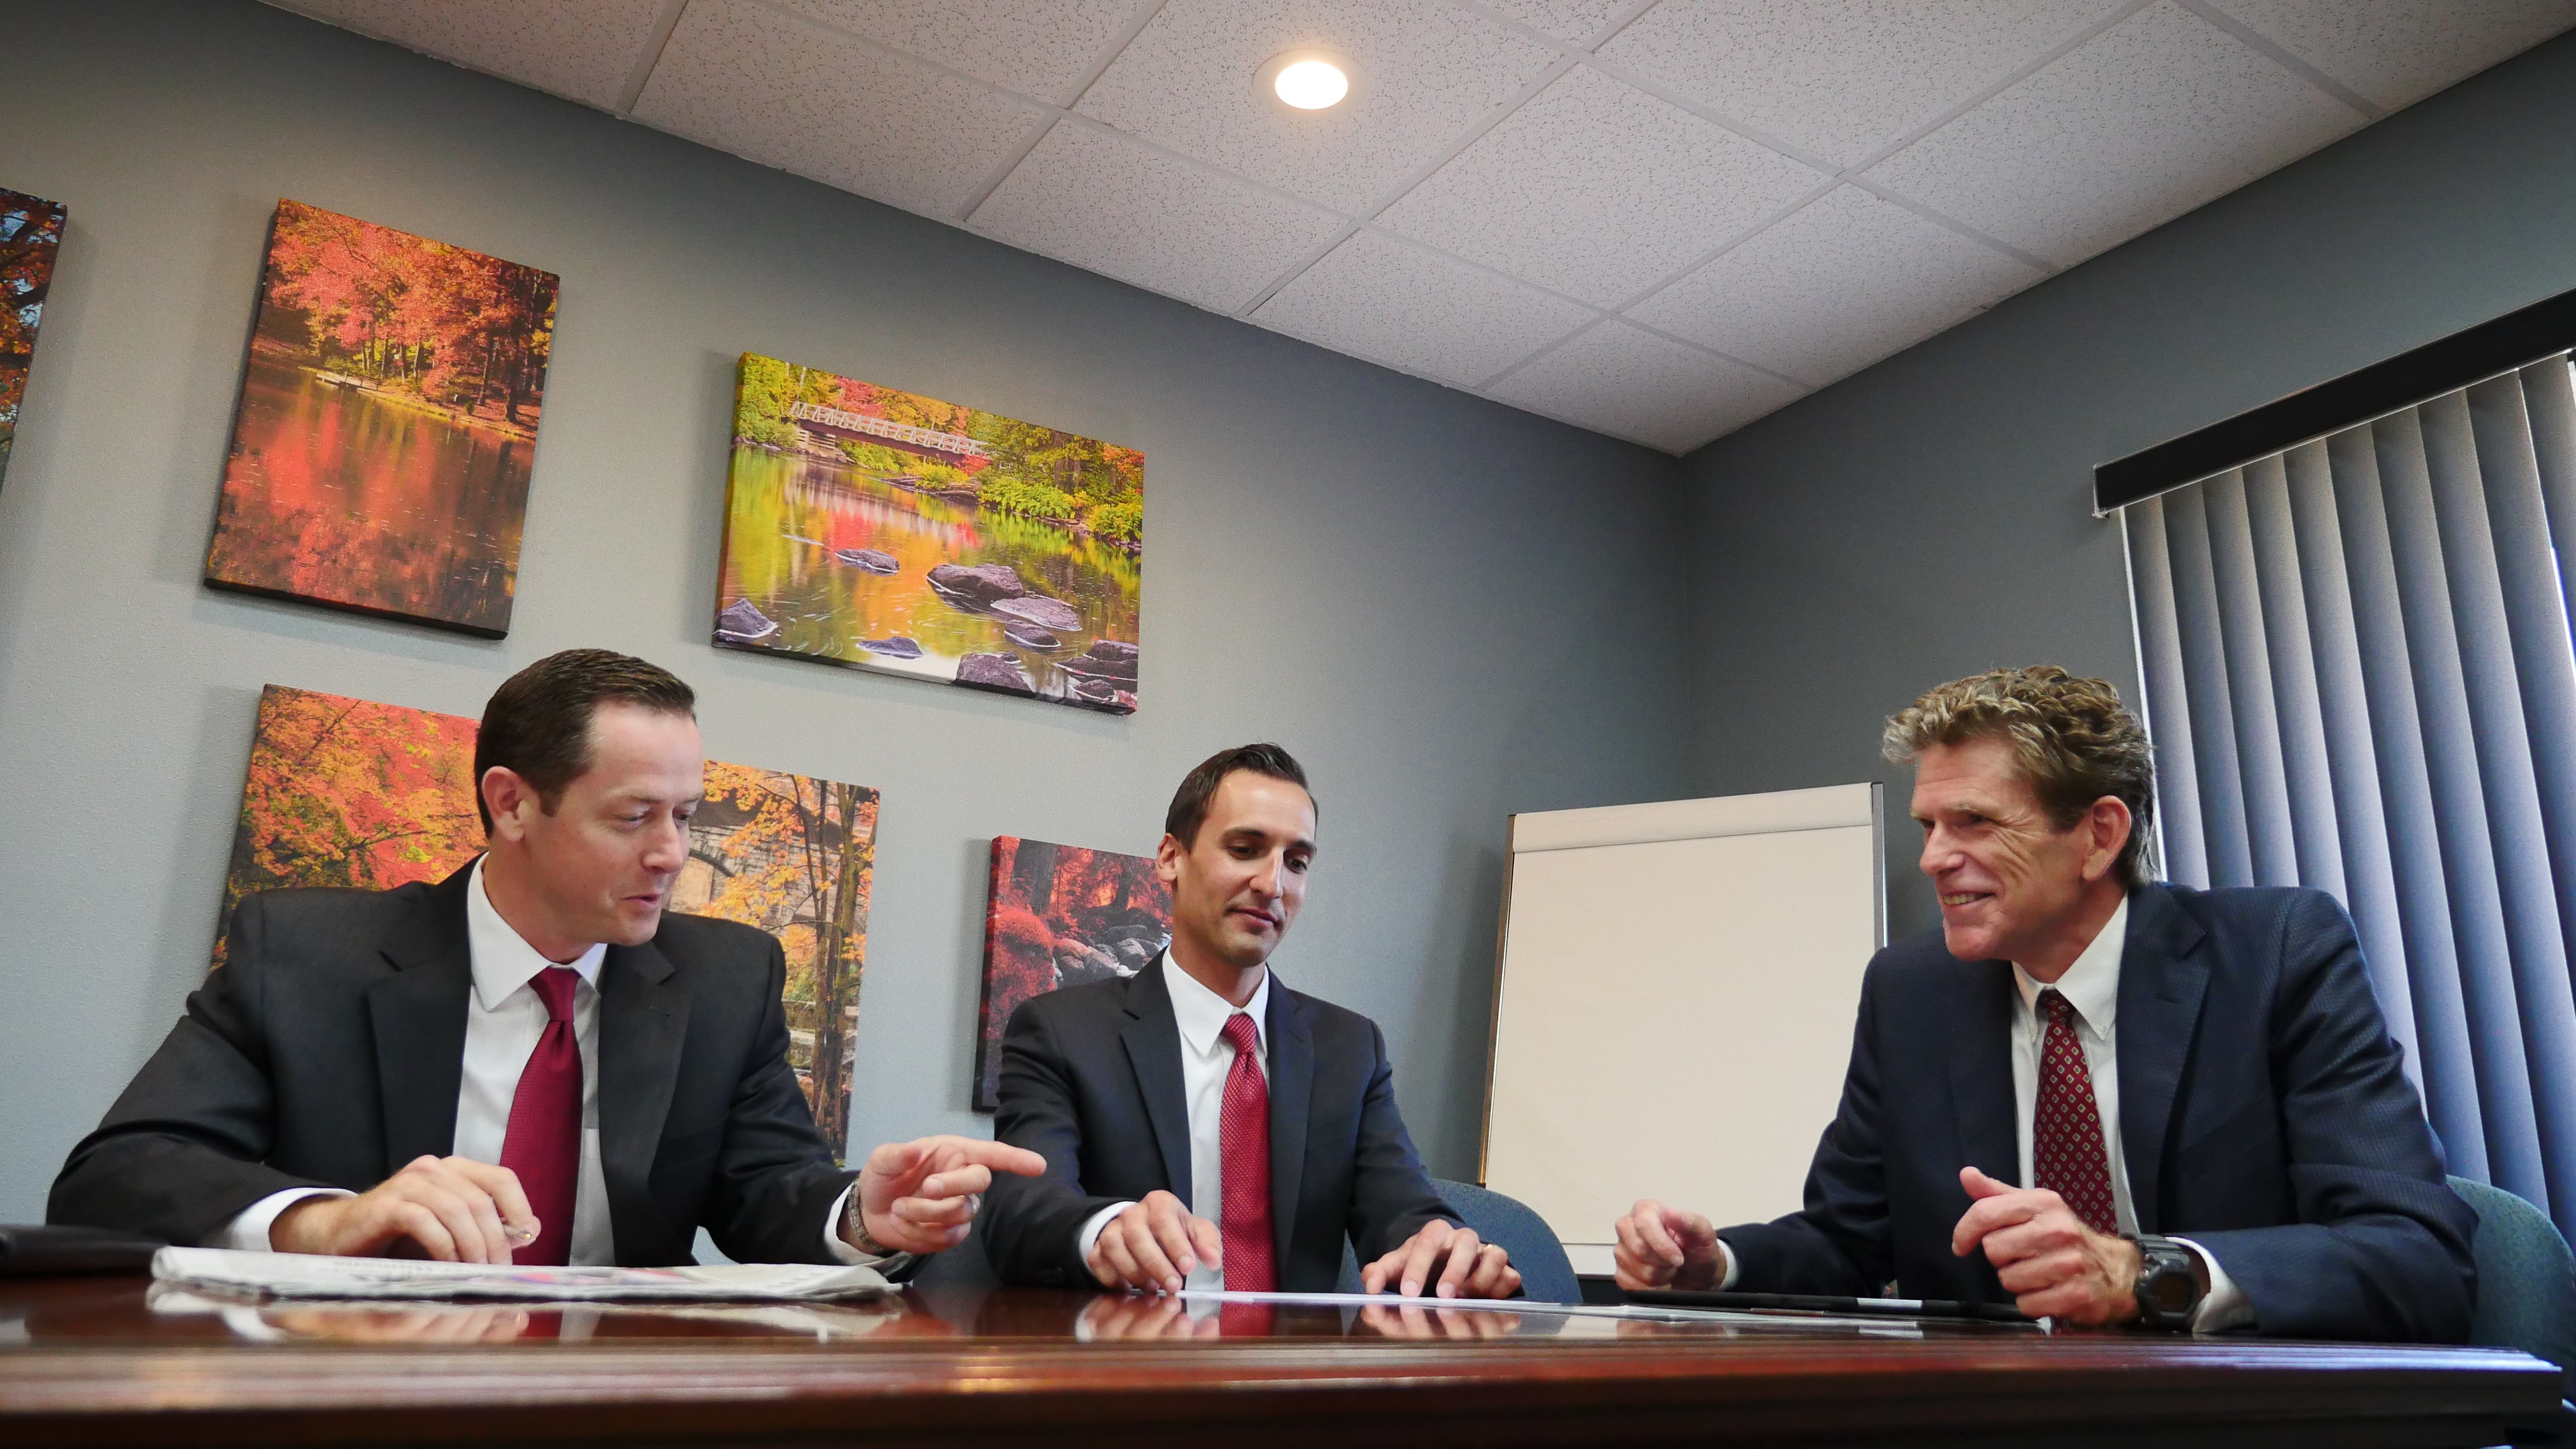 David Bennett, CFA, CFP, Joe Baer, Parker Evans, CFA, CFP, Successful Portfolios LLC